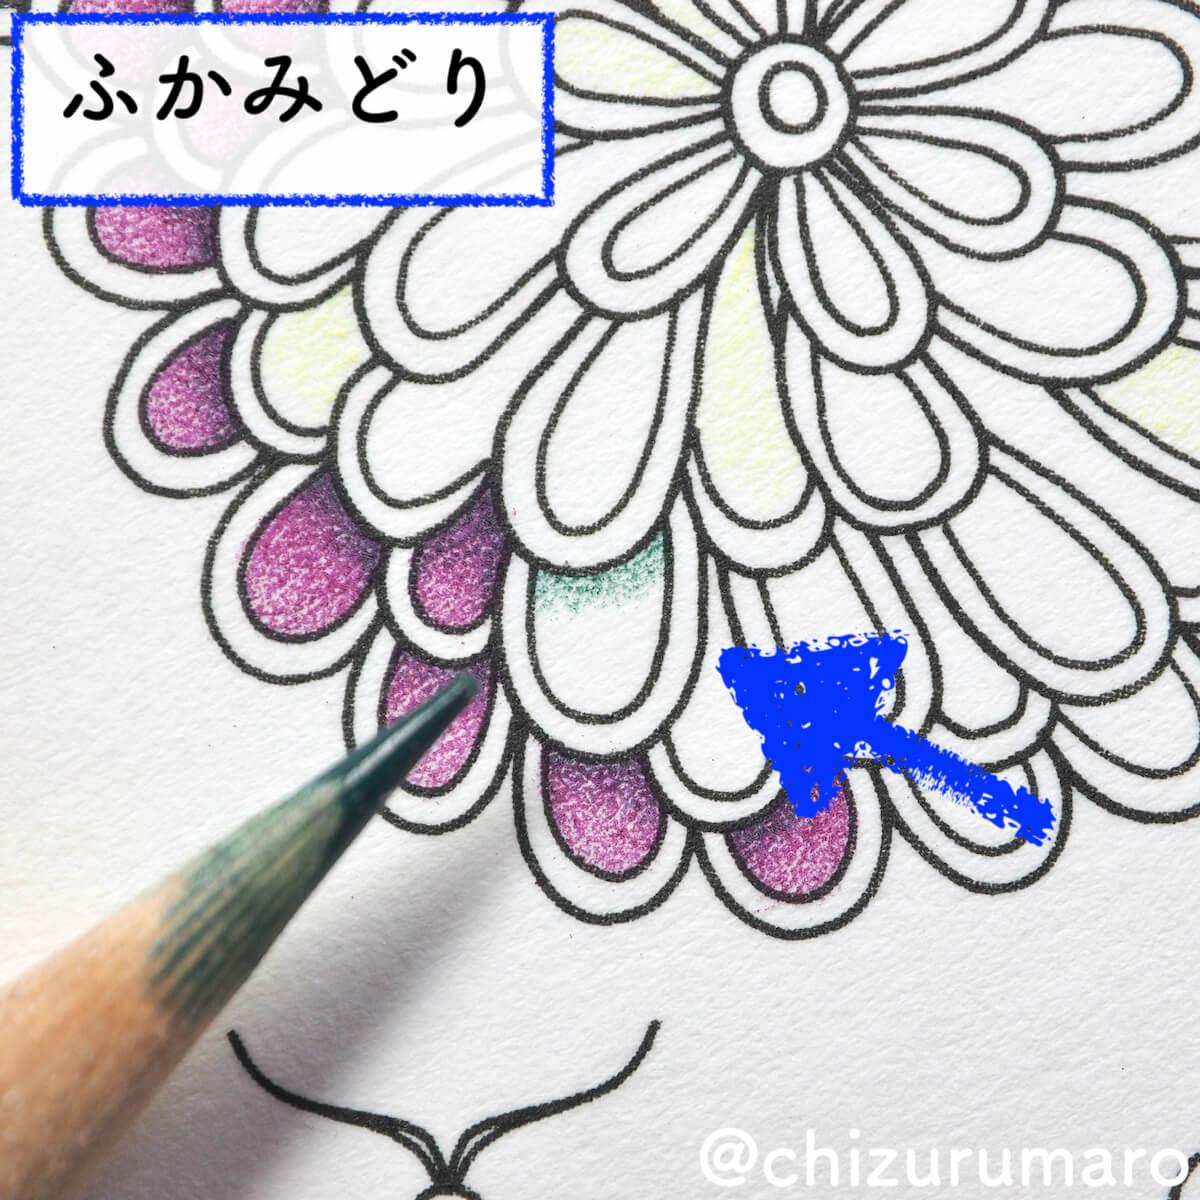 f:id:chizurumaro:20200422152539j:plain